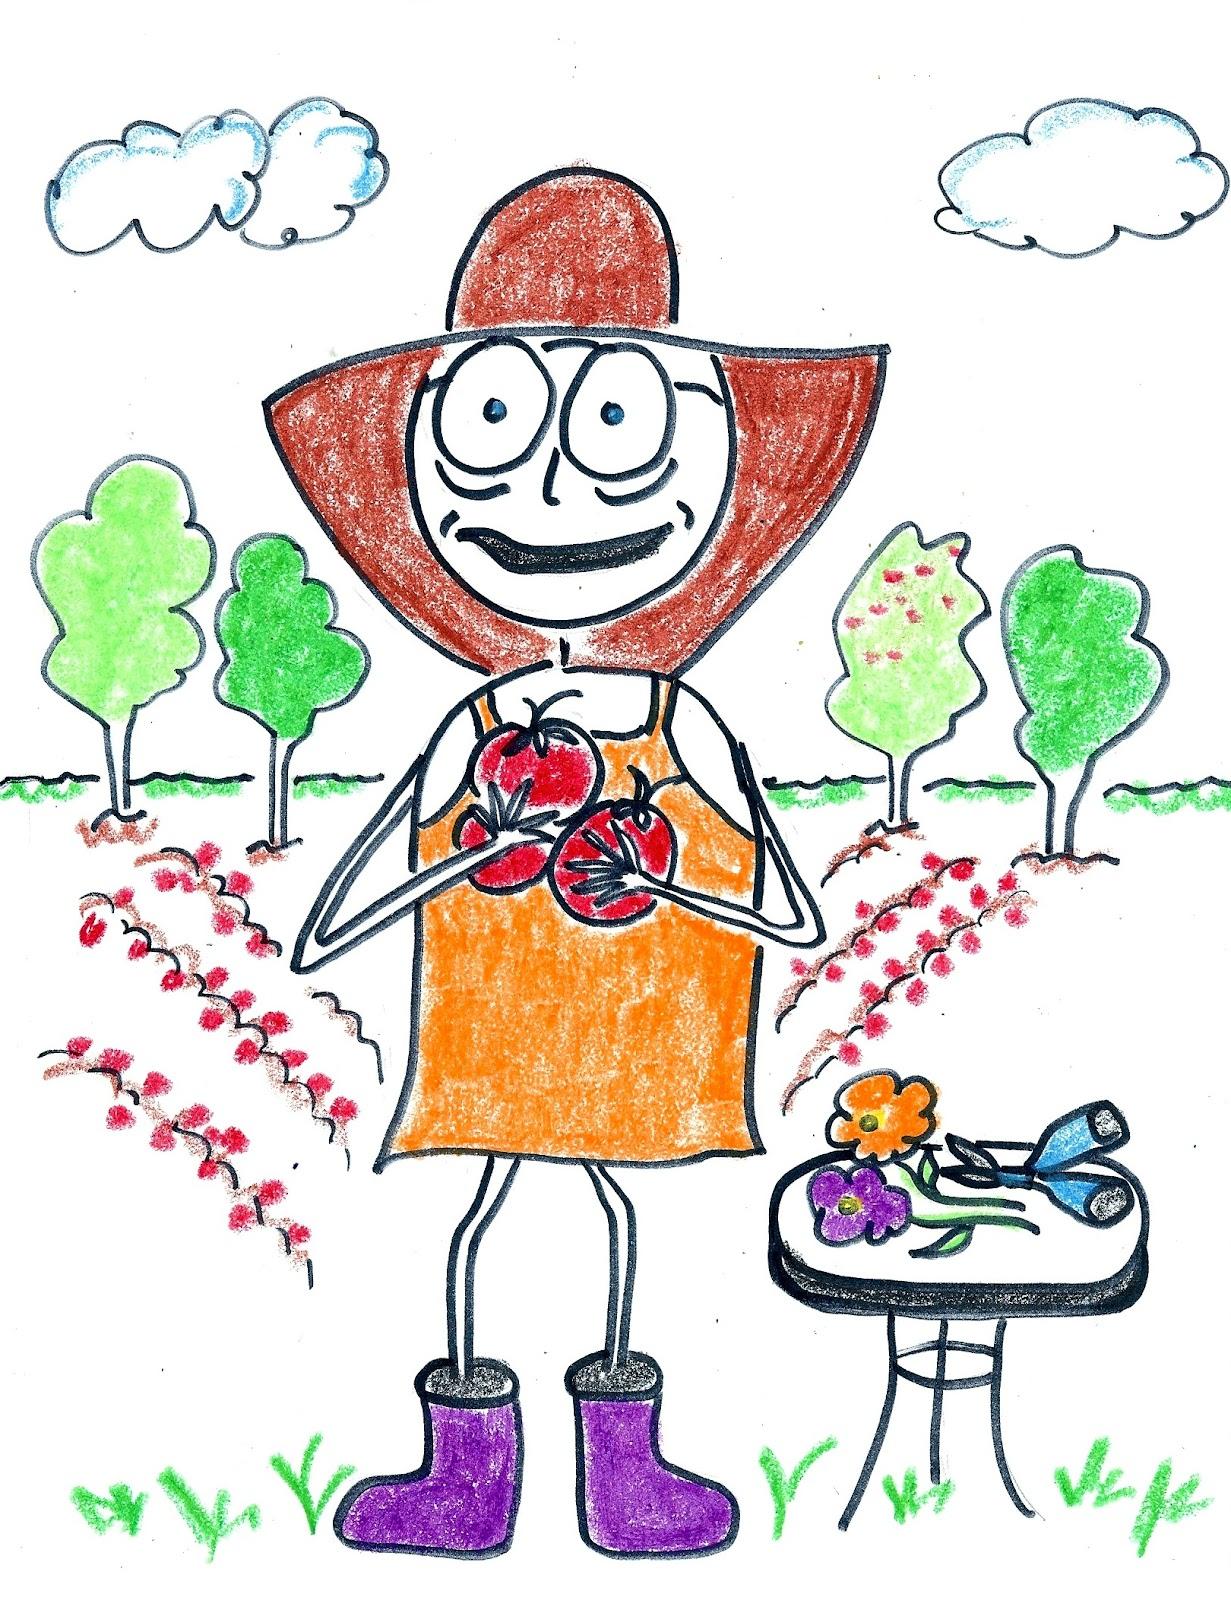 Gardening gadgets for gardenagers aka cool garden tools for Gardening tools for seniors